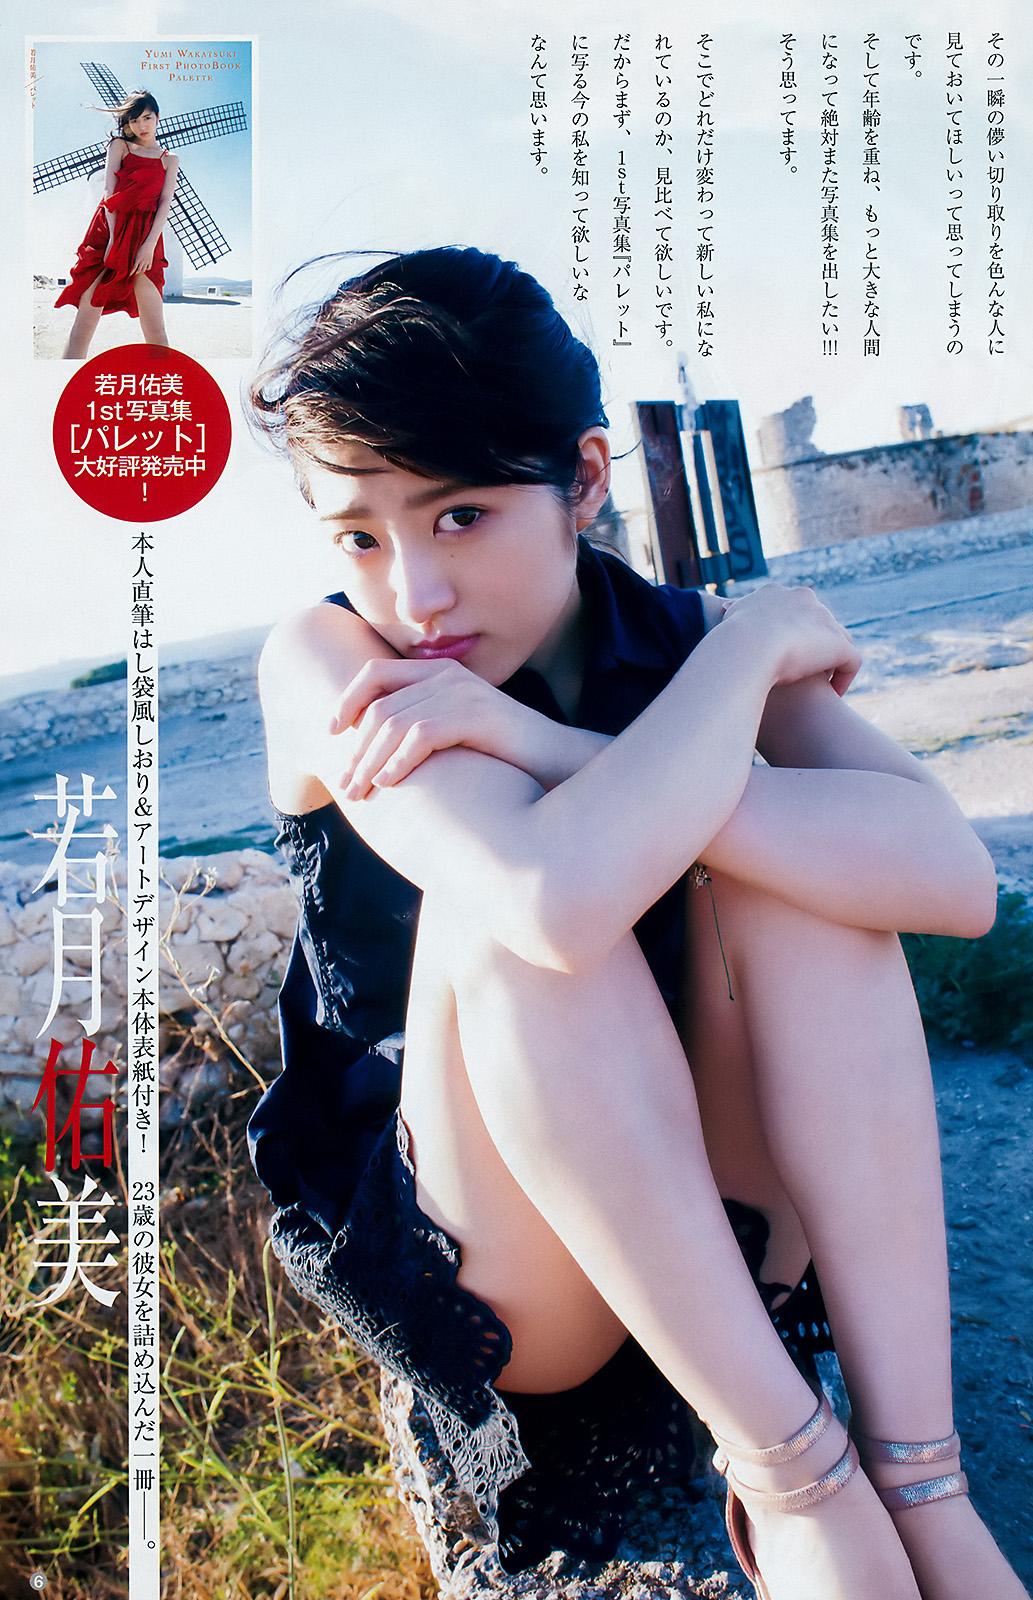 Wakatsuki Yumi 若月佑美, Young Jump 2018 No.14 (週刊ヤングジャンプ 2018年14号)